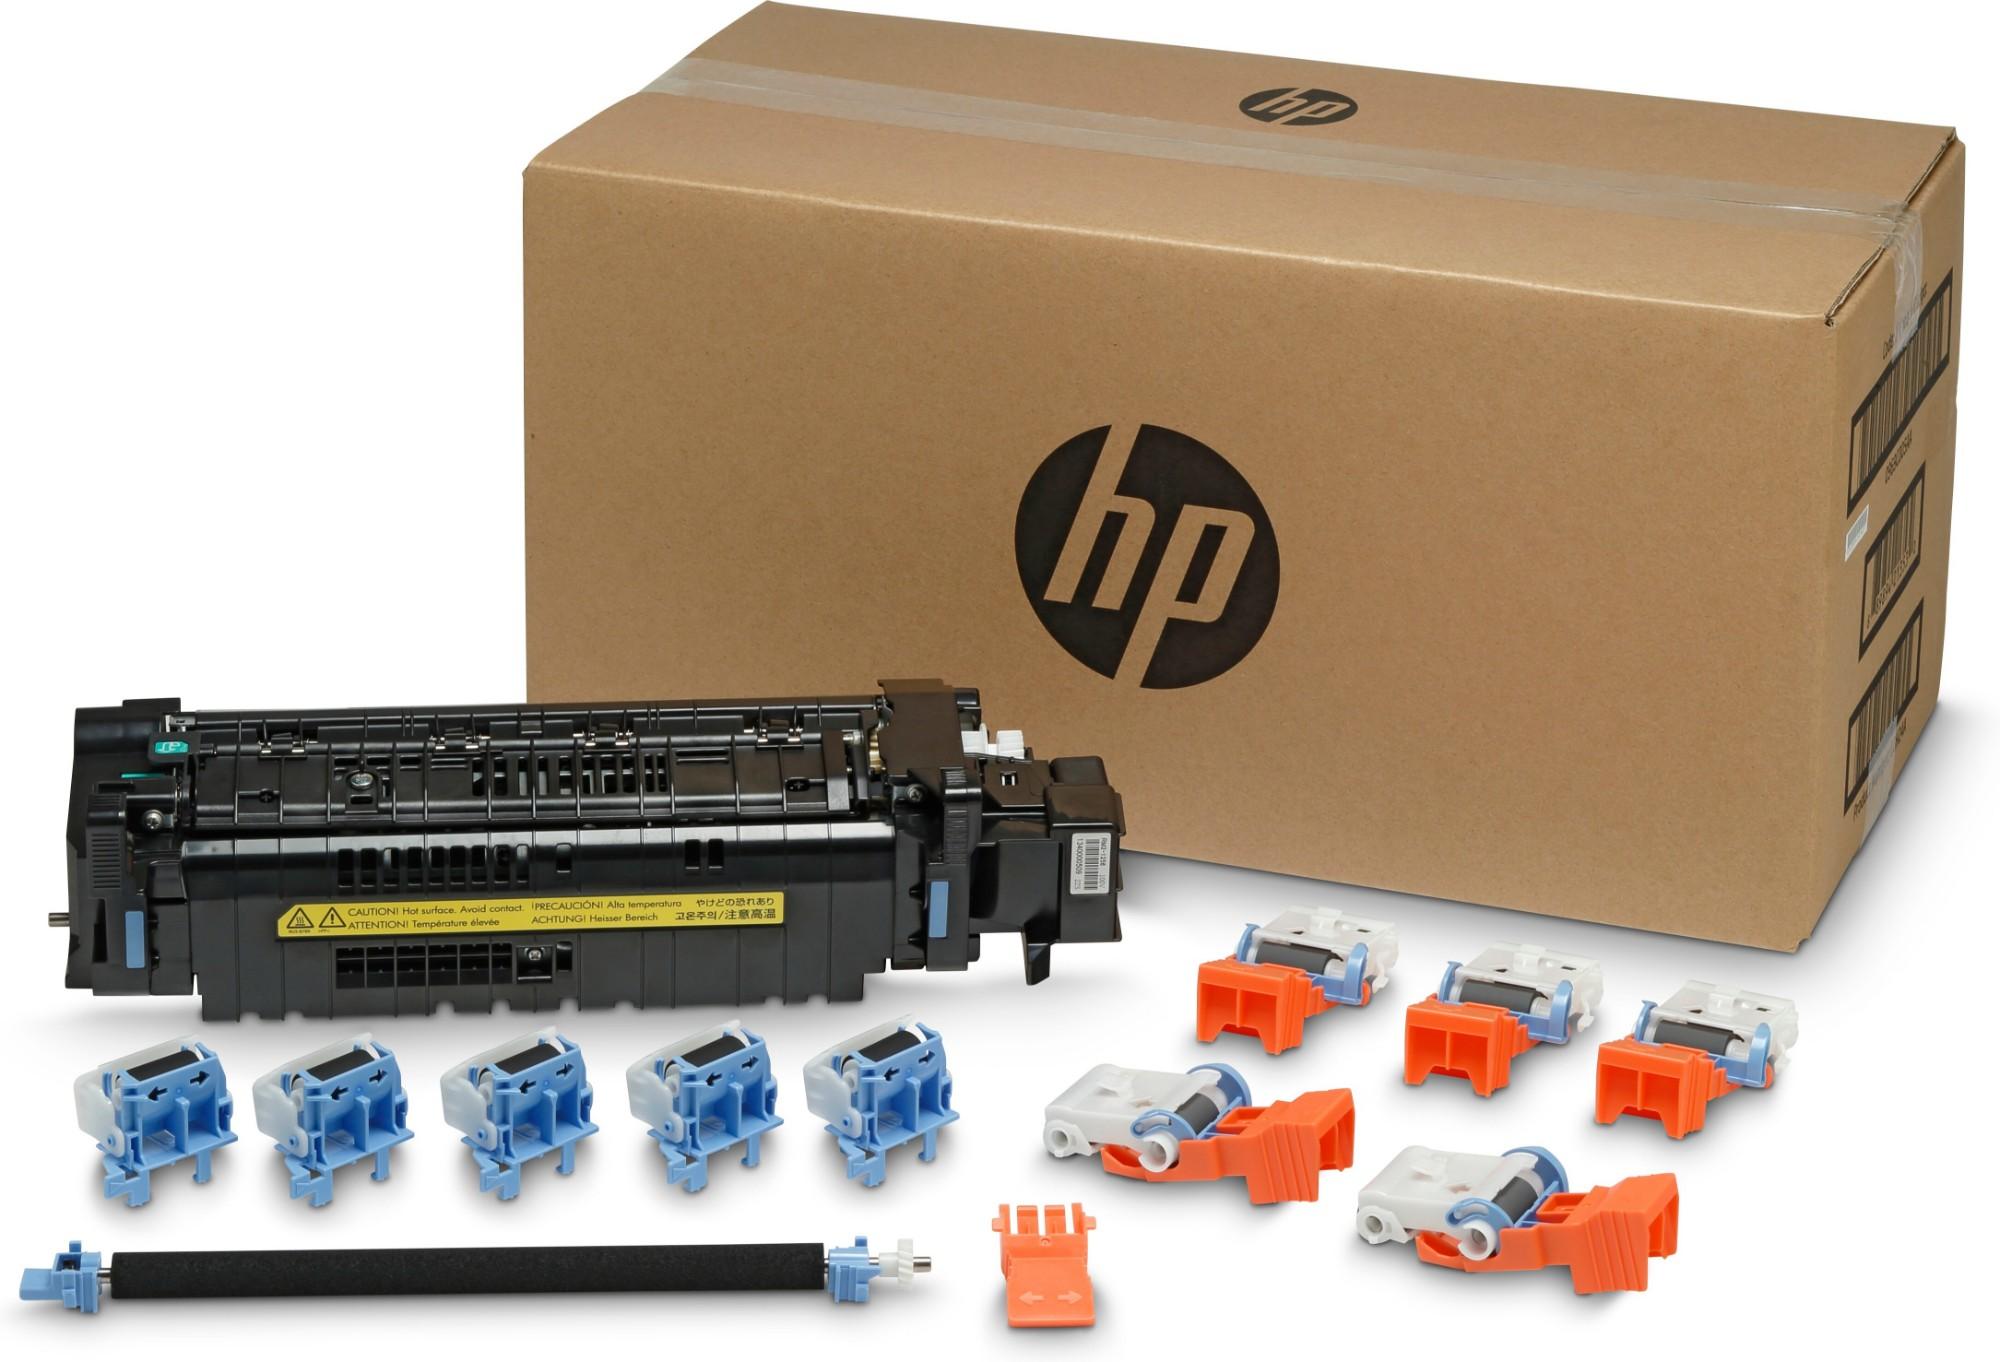 HP Kit de mantenimiento para LaserJet de 220 V